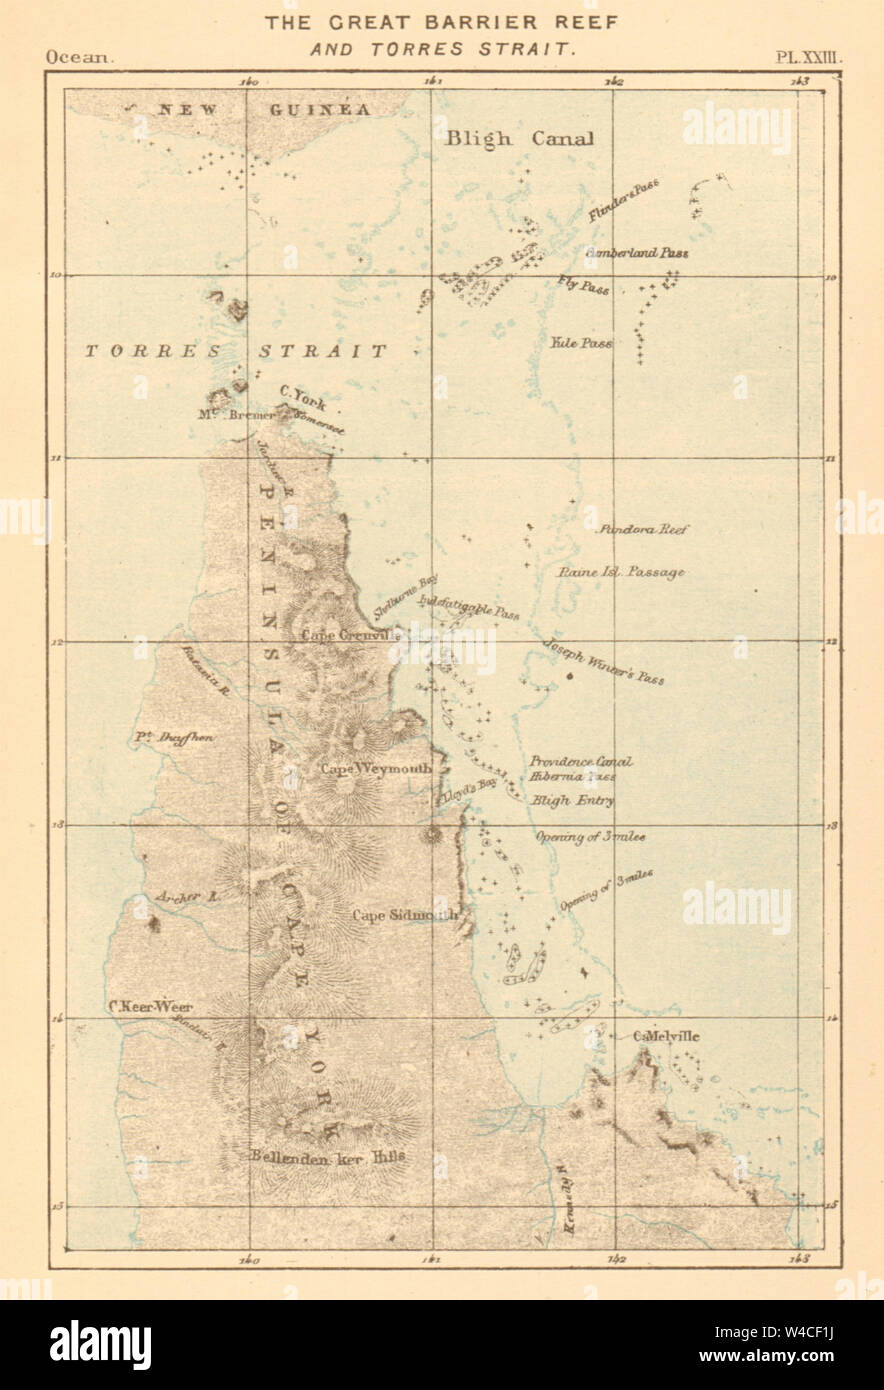 The Great Barrier Reef Australia Cape York Peninsula